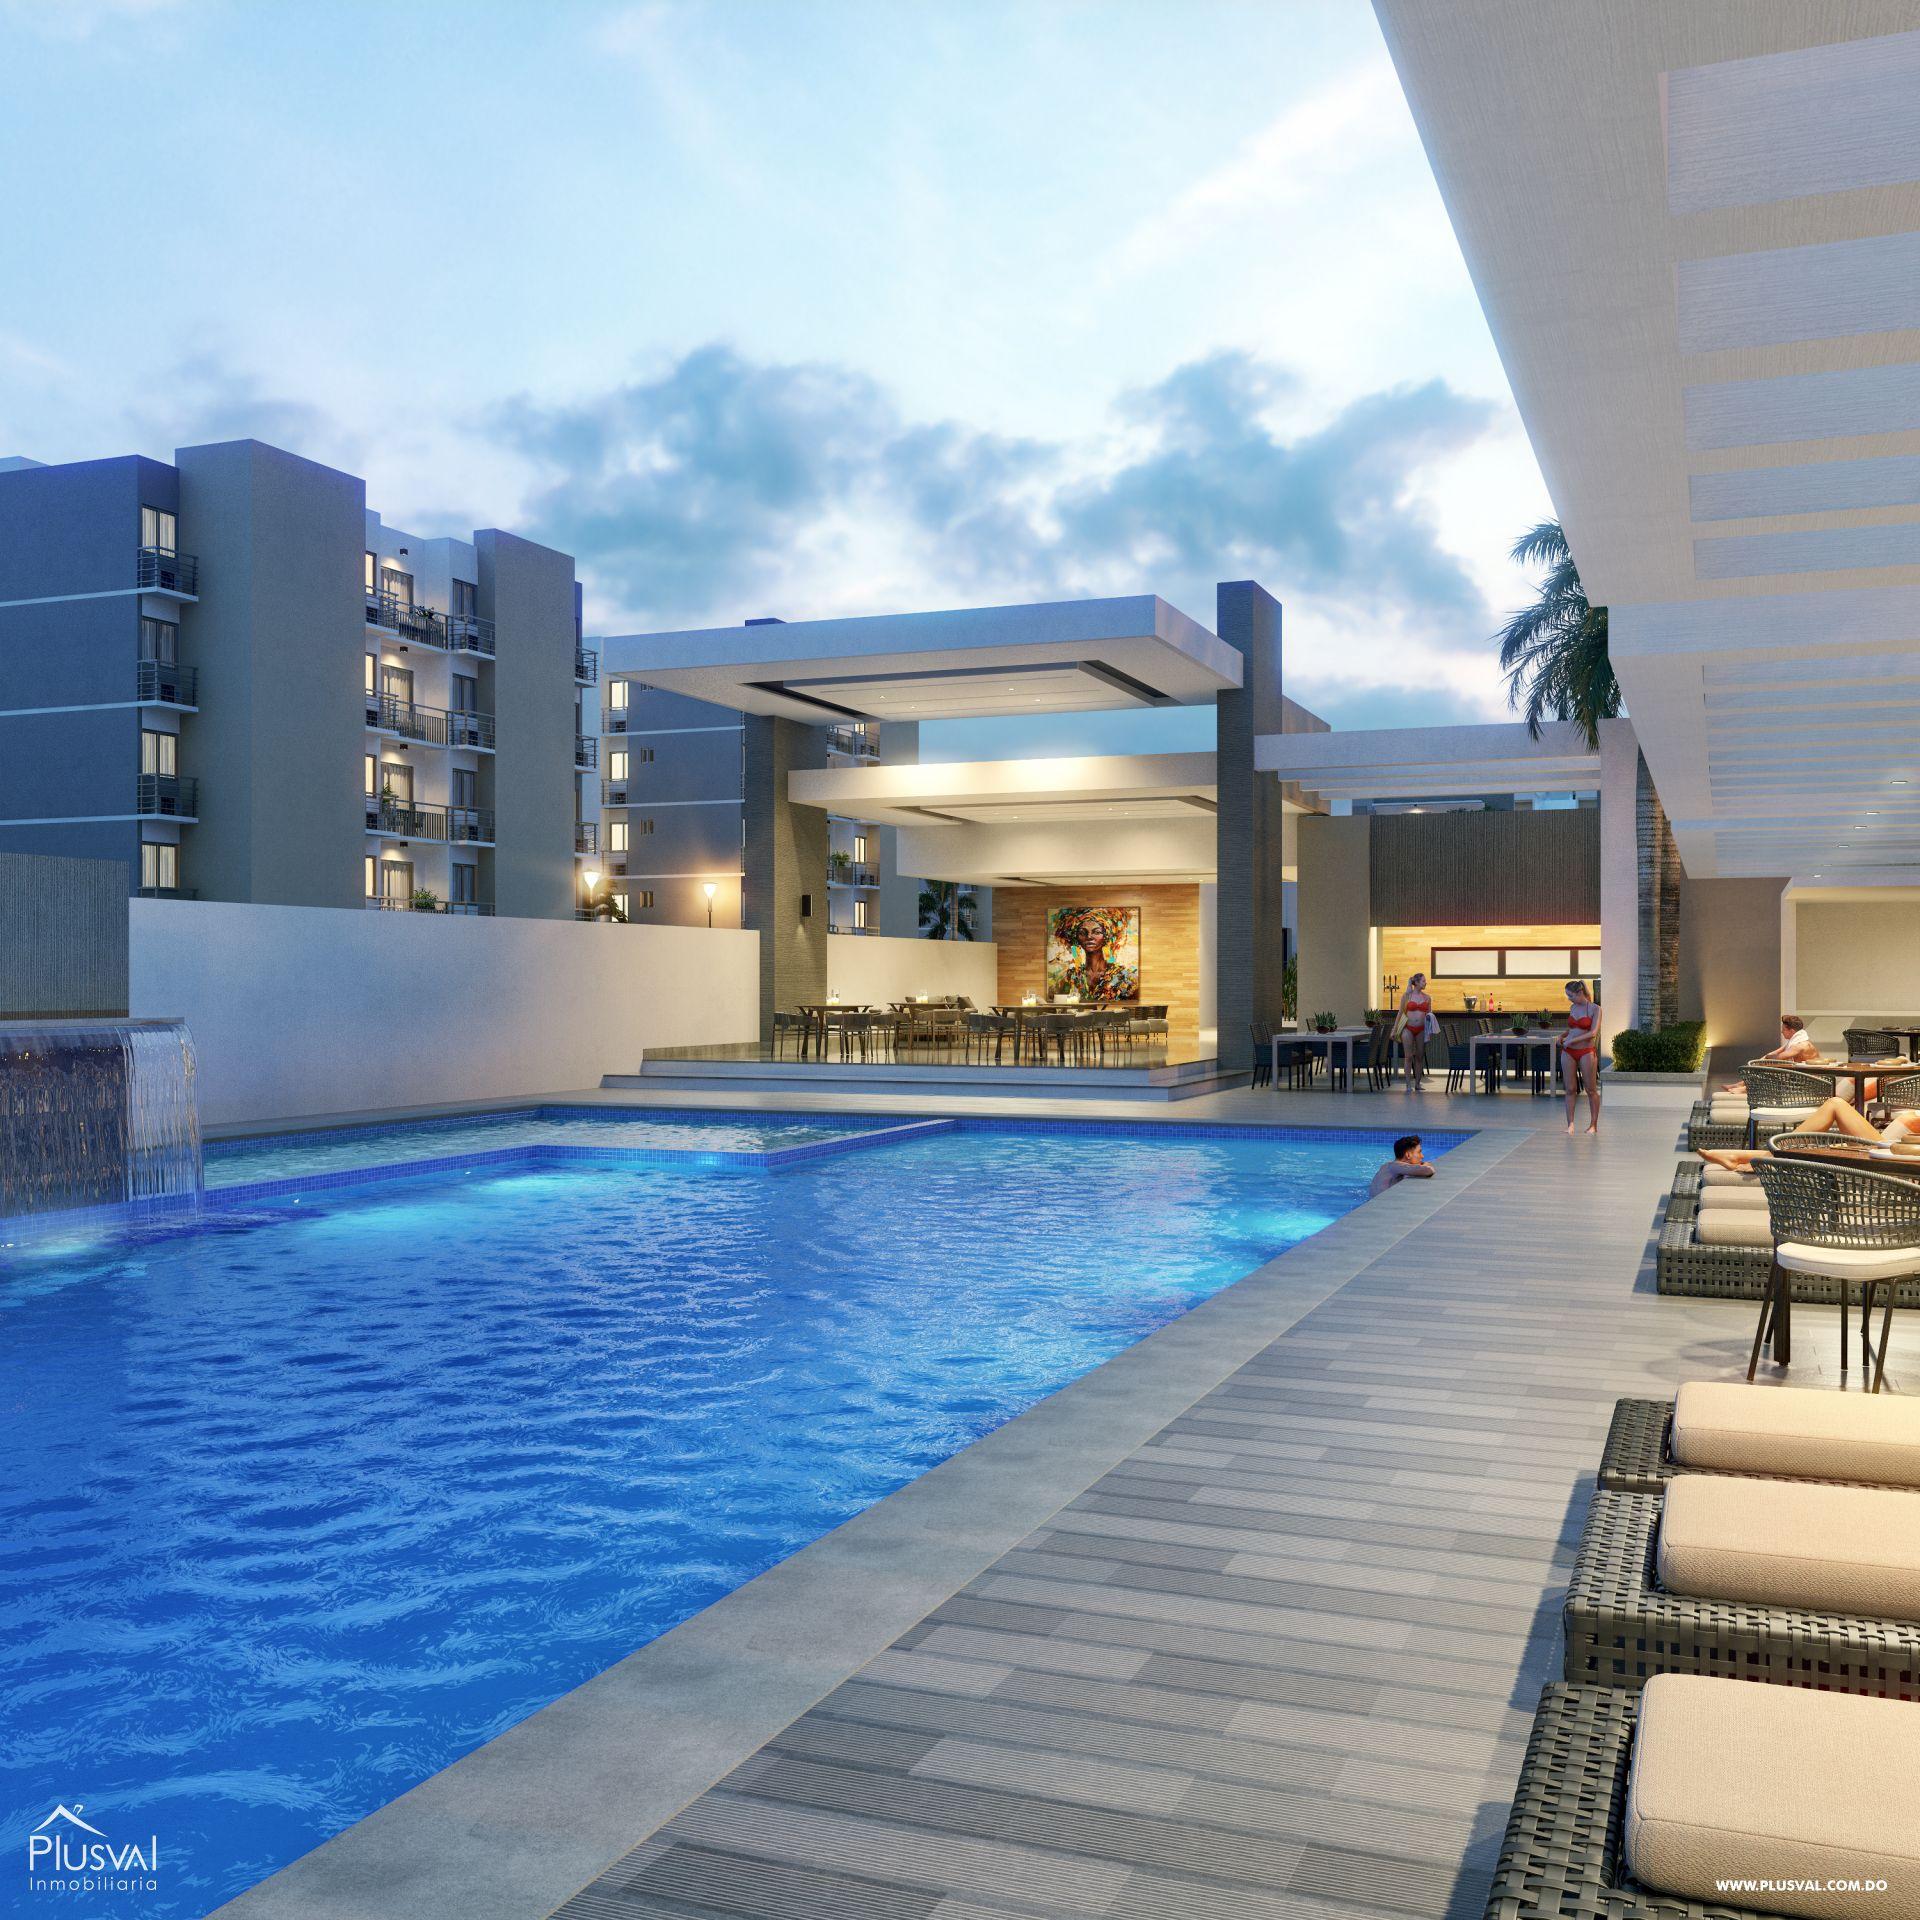 Residencial de apartamentos en venta, en Bávaro